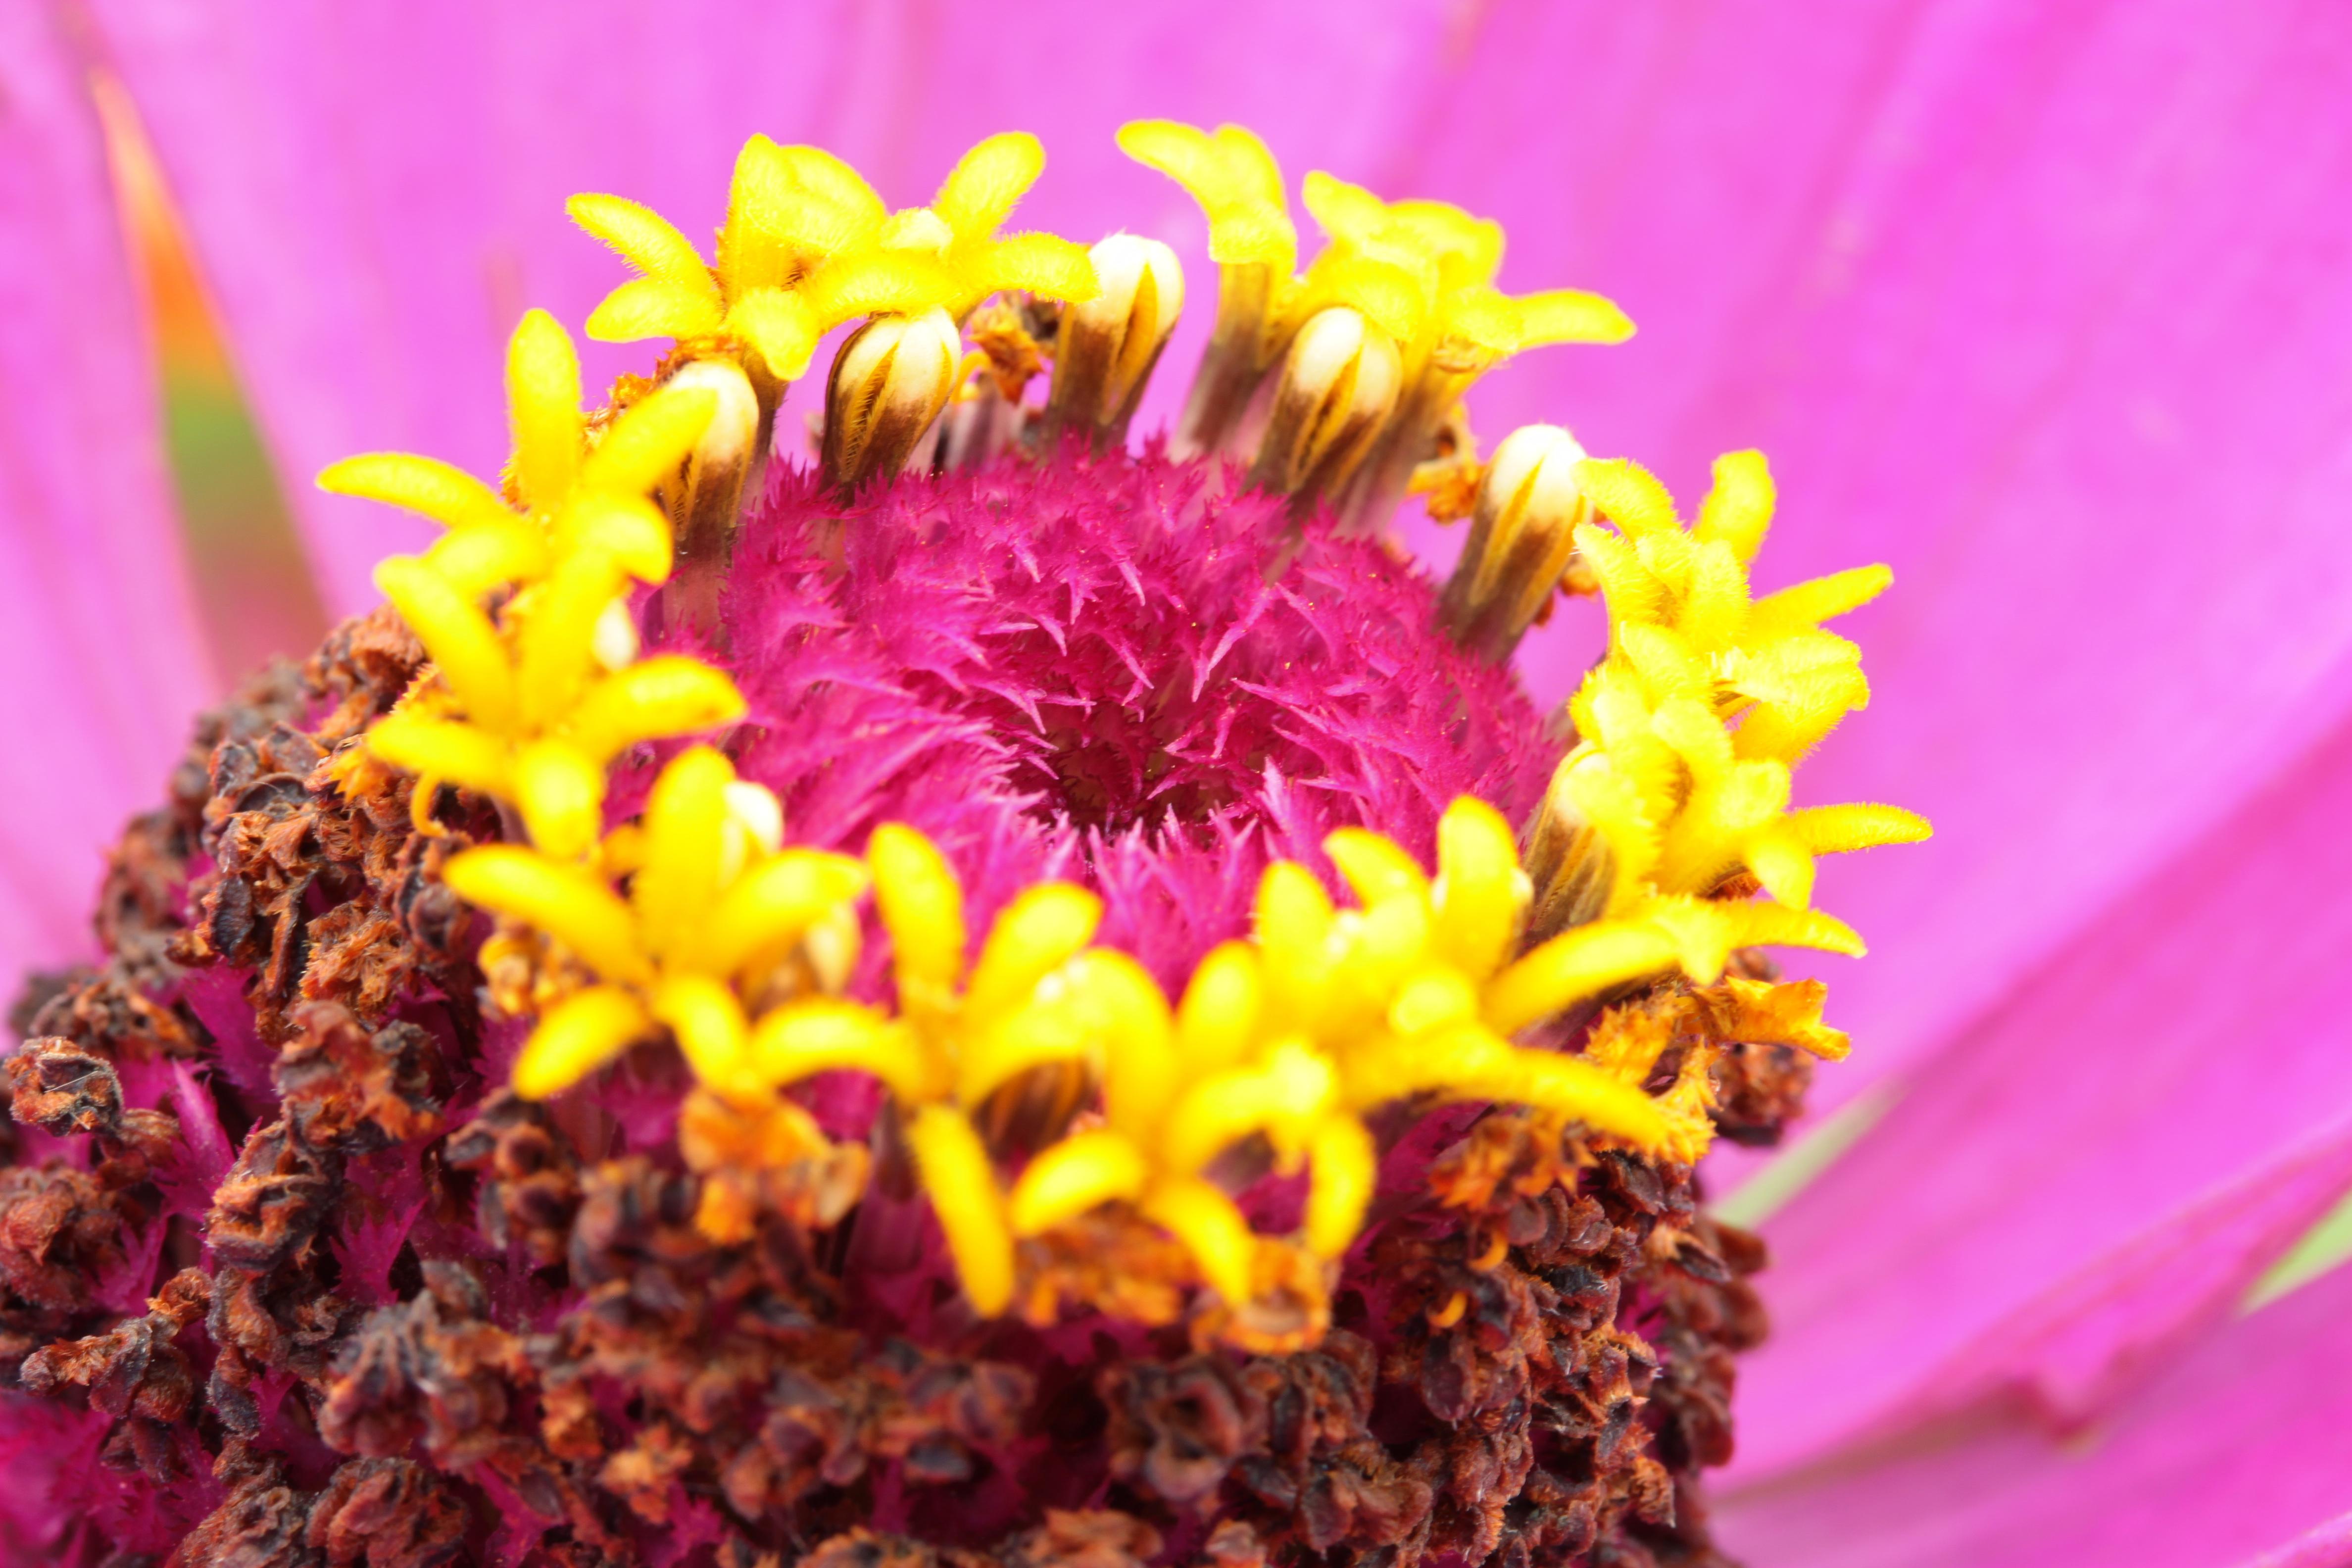 Gartenpflanzen  File:Gartenpflanzen 2012-09-01-0283.jpg - Wikimedia Commons